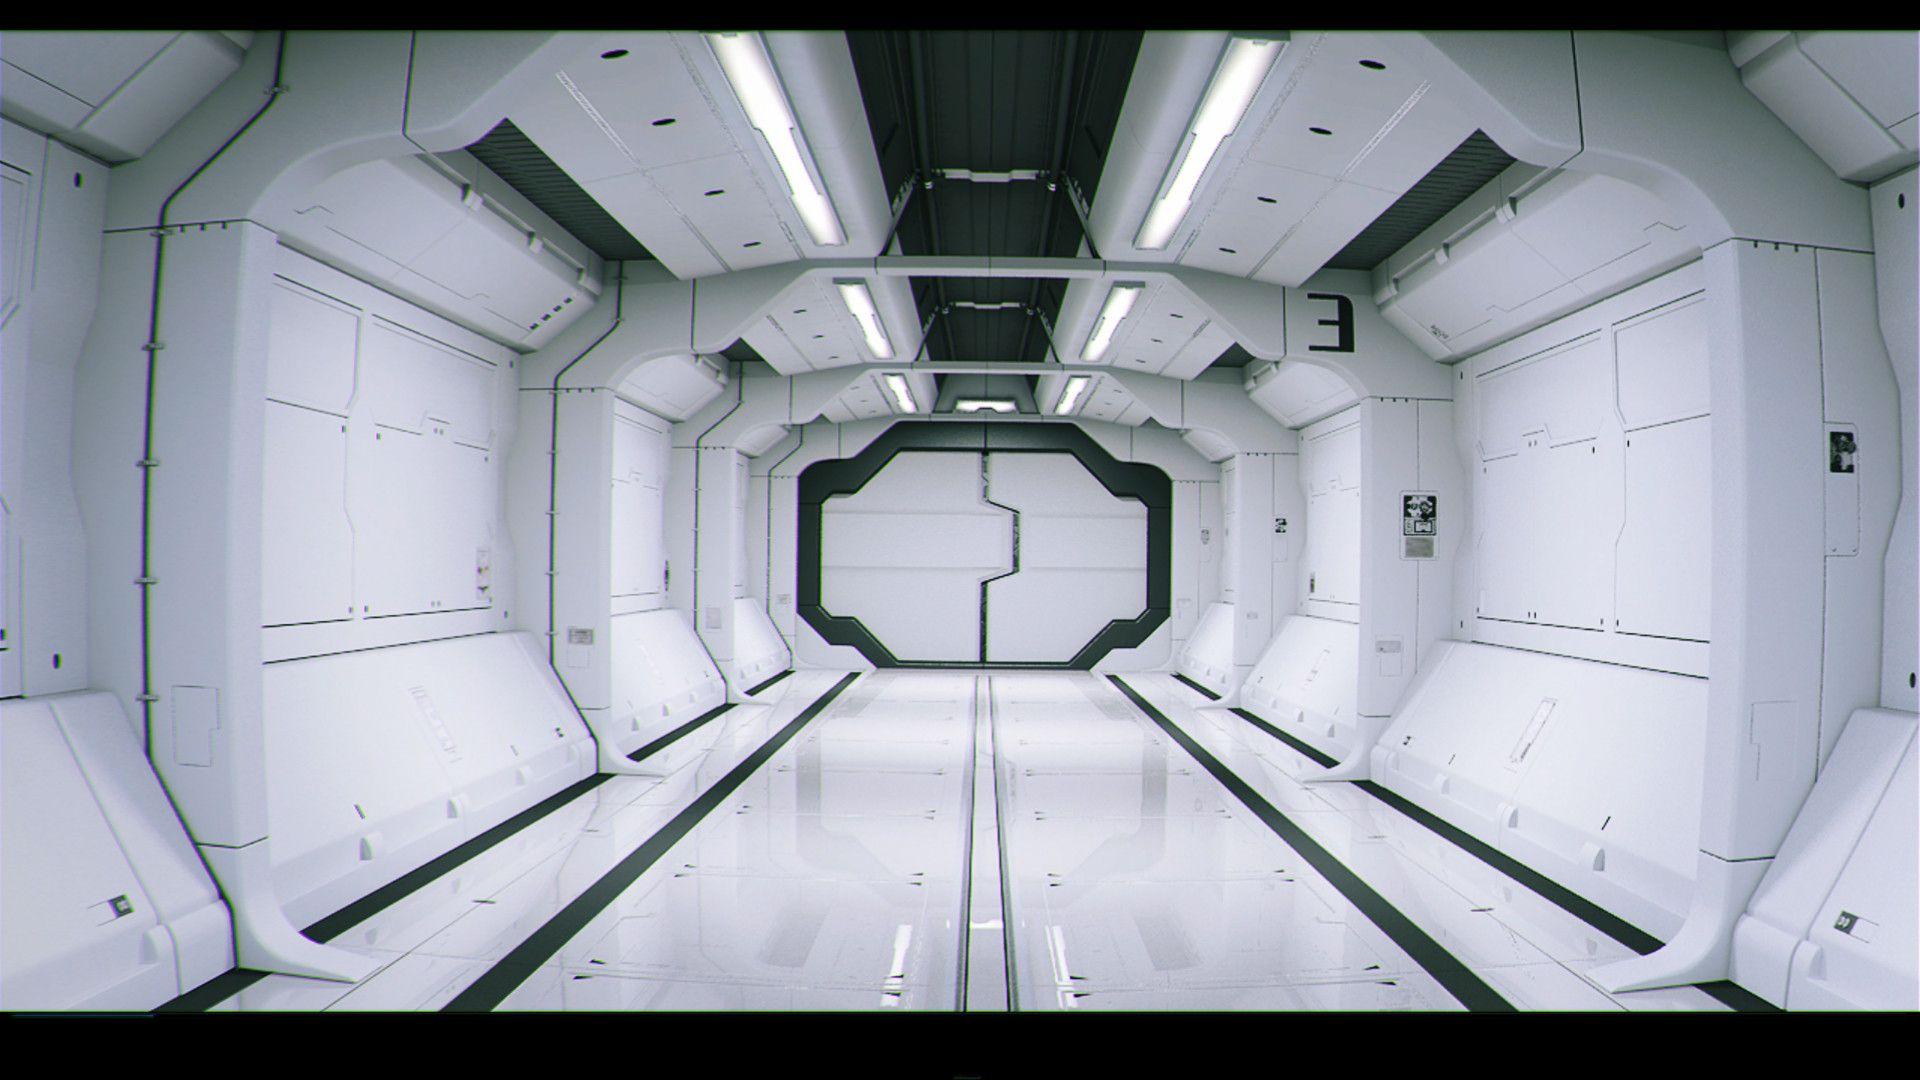 Robots Man Robots Awesome Sci Fi Interior Renderings Description From Pinterest Com I Searched For Spaceship Interior Futuristic Interior Sci Fi Wallpaper